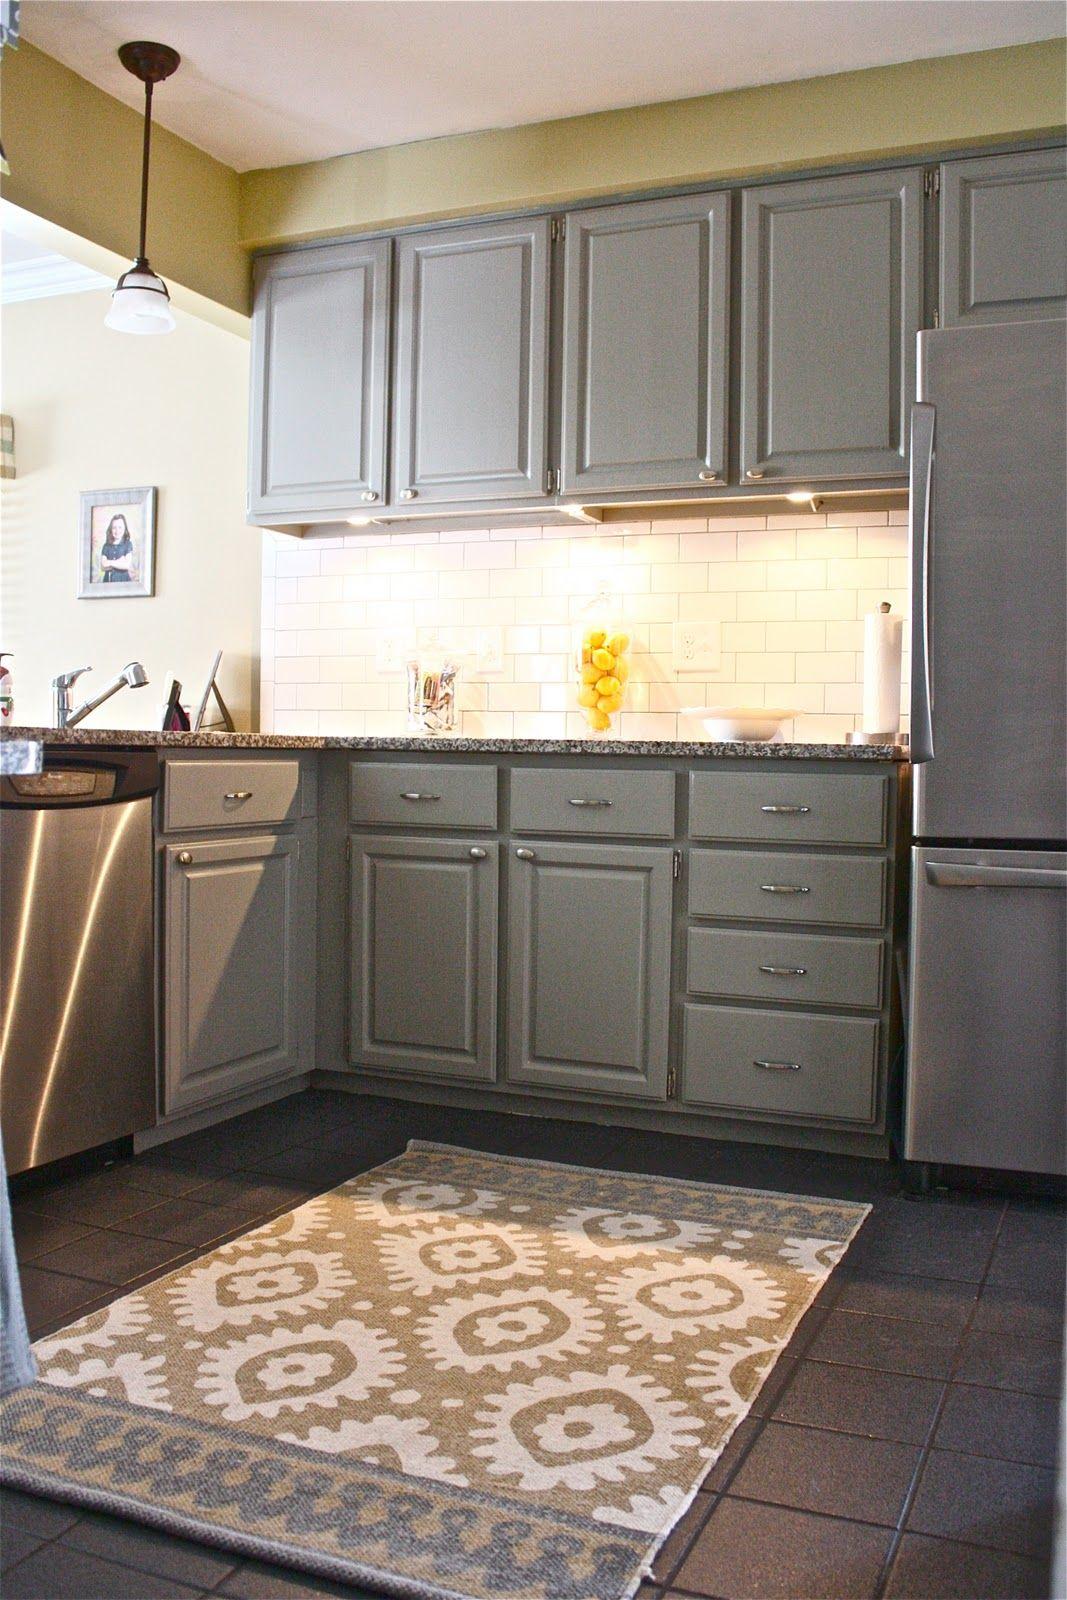 Best 25+ Grey yellow kitchen ideas on Pinterest | Grey and yellow ...